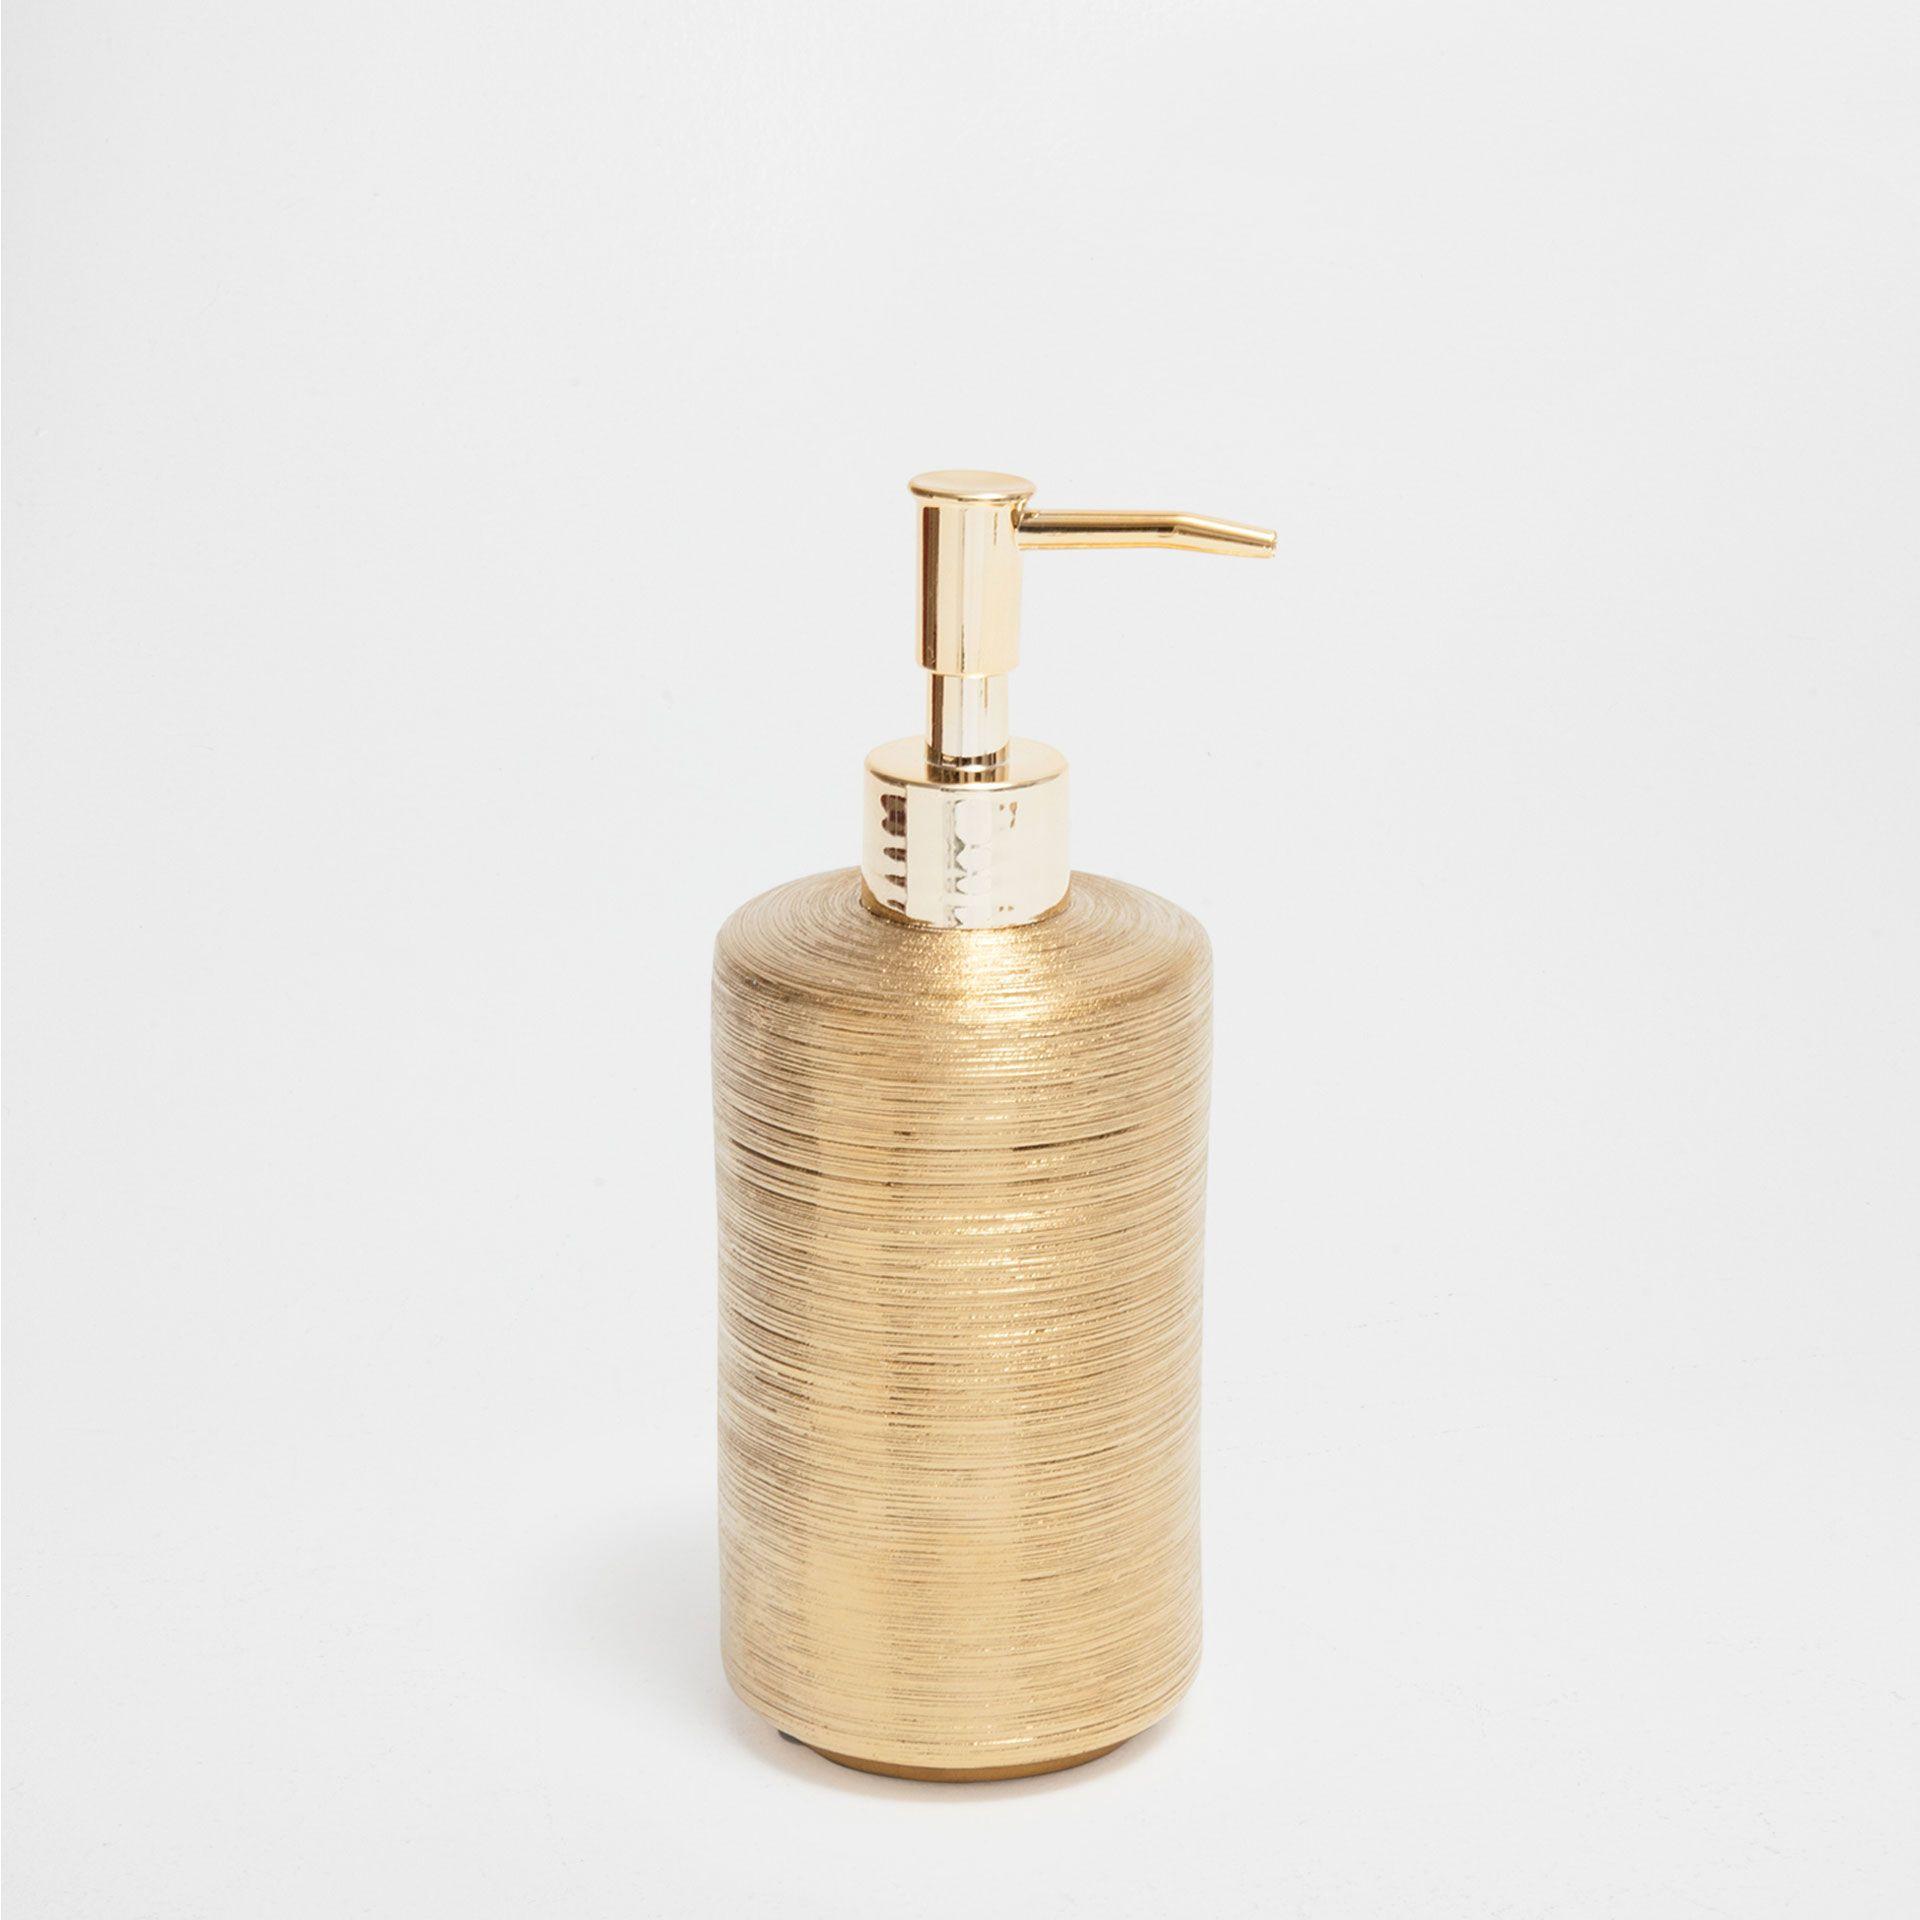 SCORED GOLDEN CERAMIC BATHROOM SET Hotel Collection Bathroom